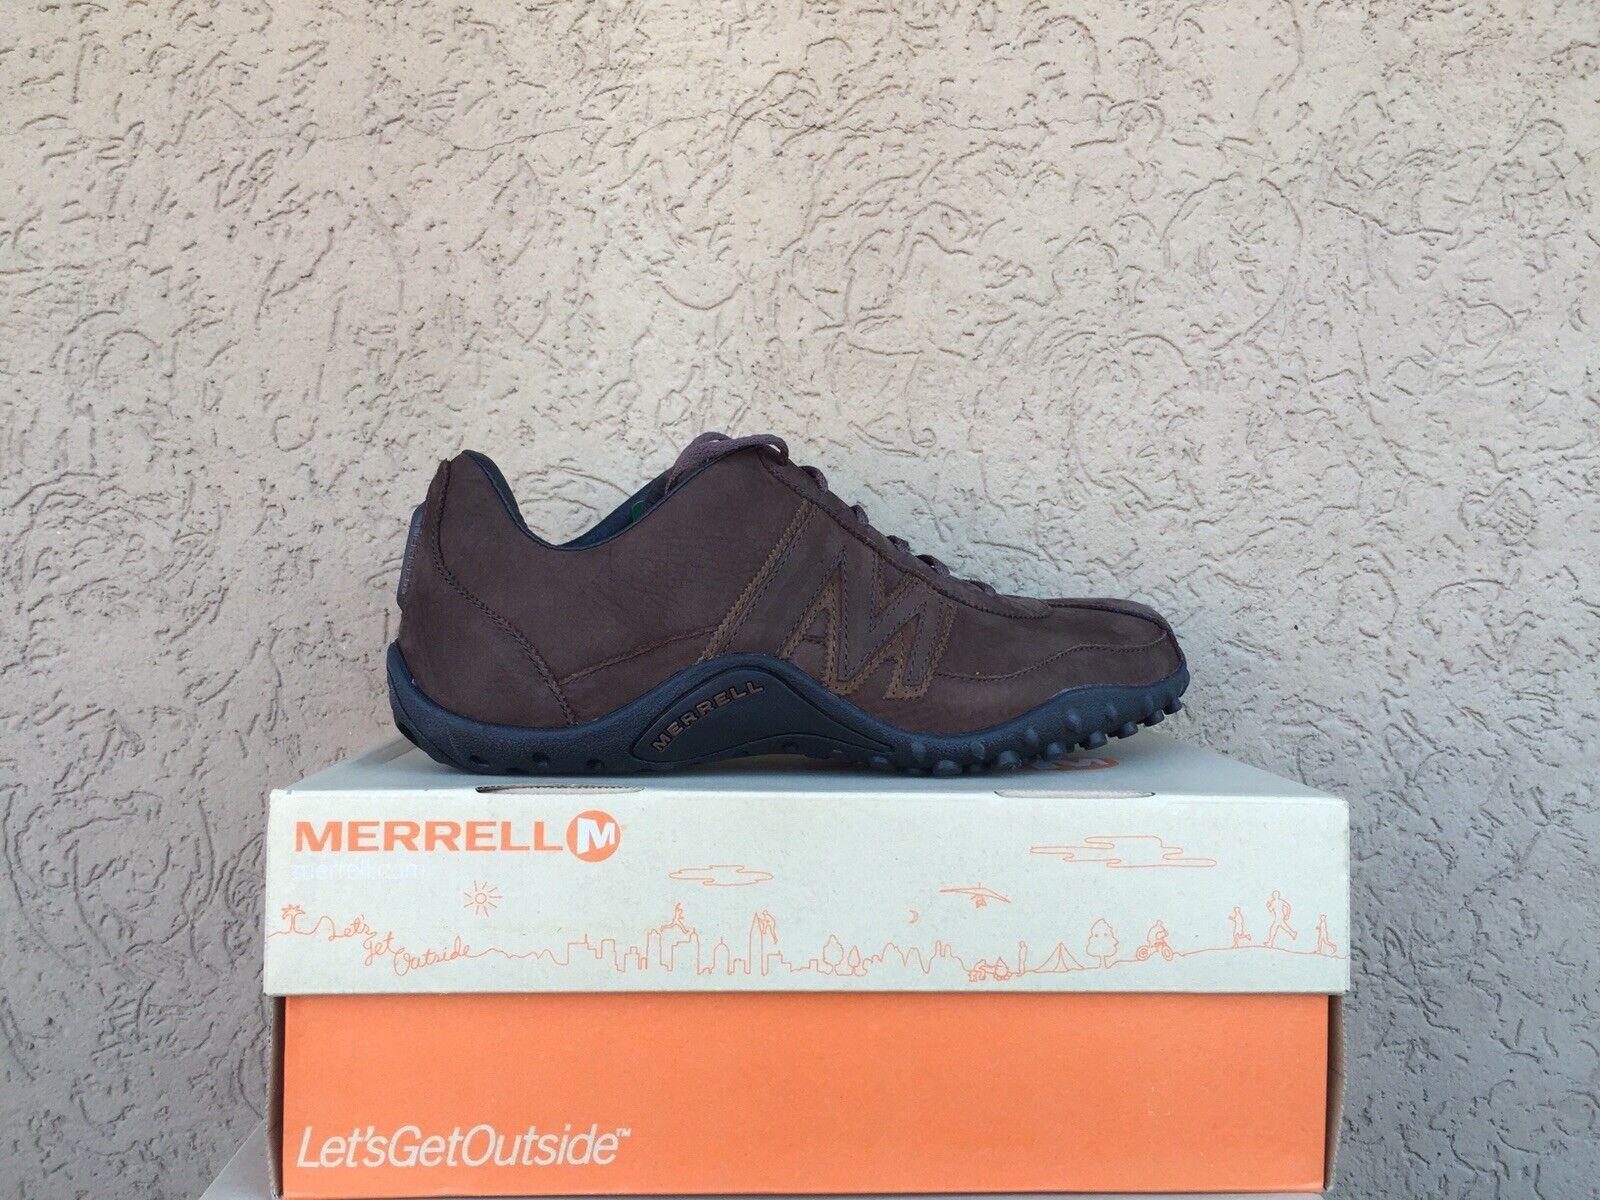 shoes MERRELL SPRINT BLAST - nr 43 - brown - NUOVE - SNEAKER MERRELL OFFERTA